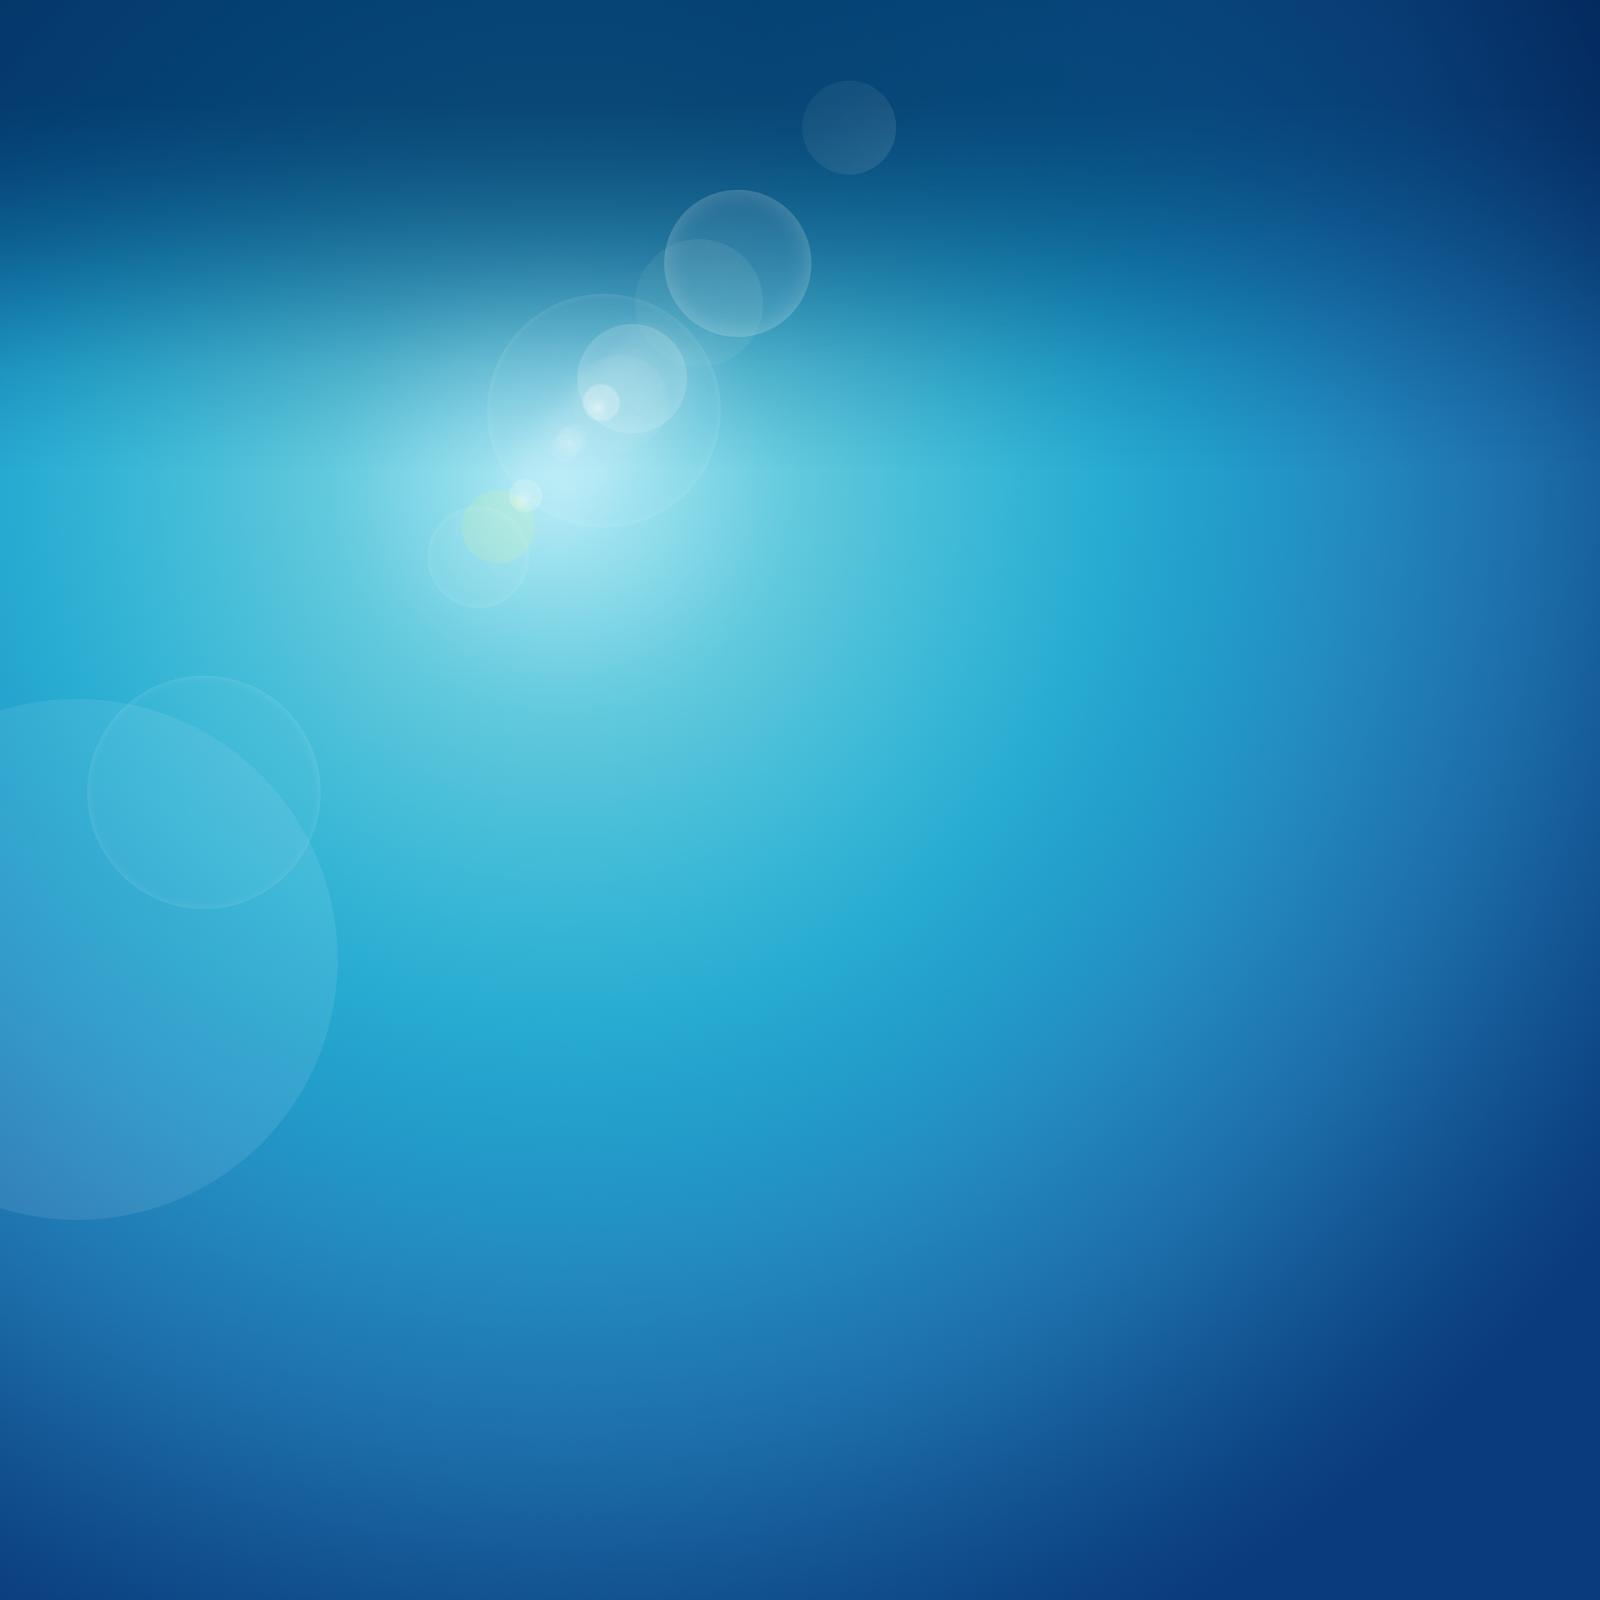 download Download Samsung Galaxy S4 Wallpapers Original 1600x1600